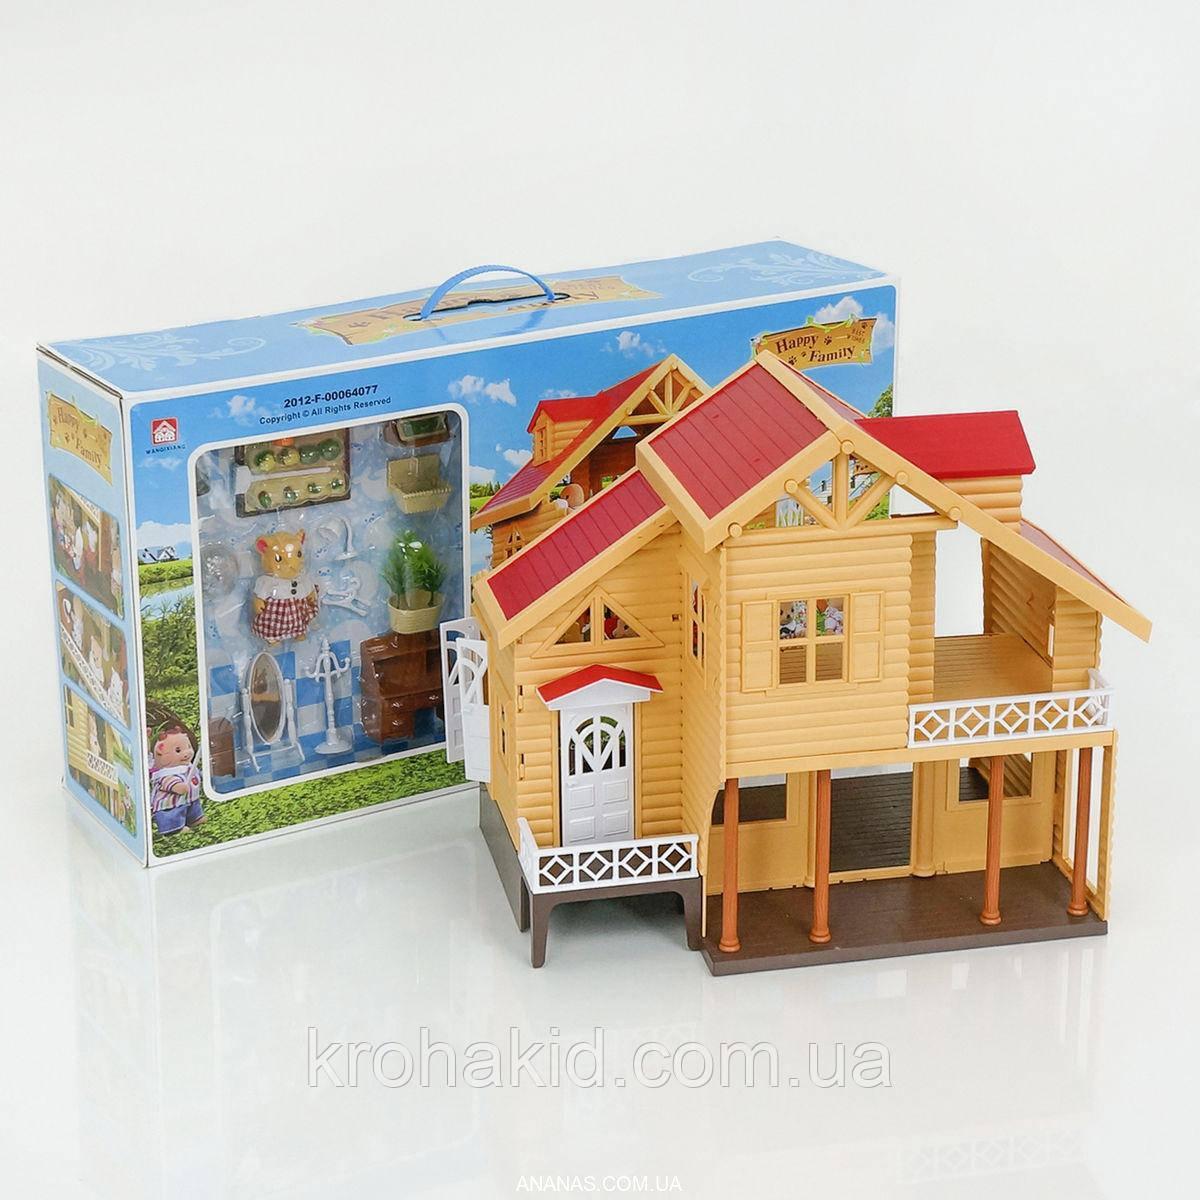 Будиночок з флоксовыми тваринами Happy Family 012-03 Заміський Будиночок (аналог Sylvanian Families)